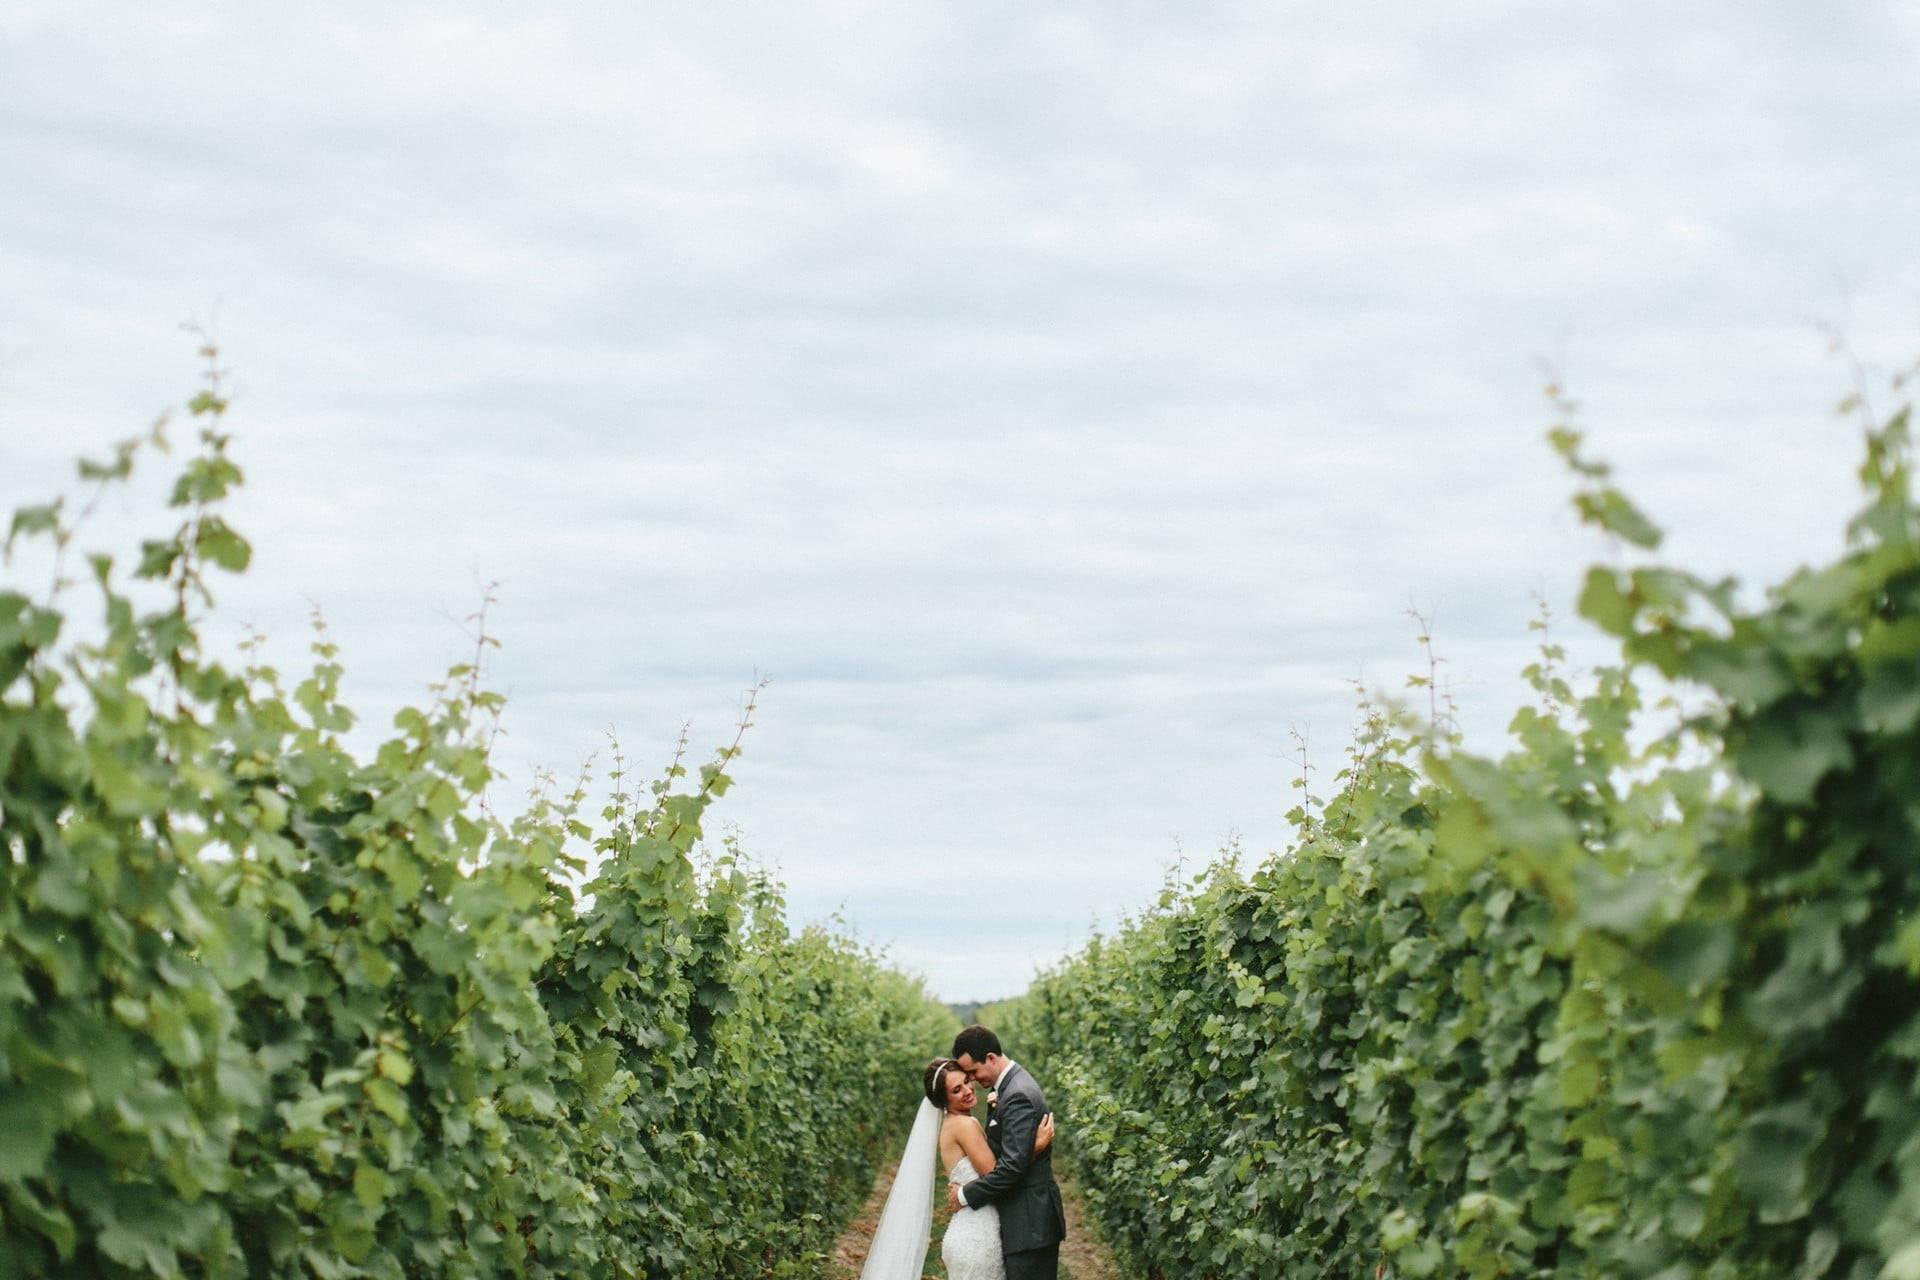 Hero image for Maranda and Chad's Stunning Rustic Wedding at Honsberger Estate